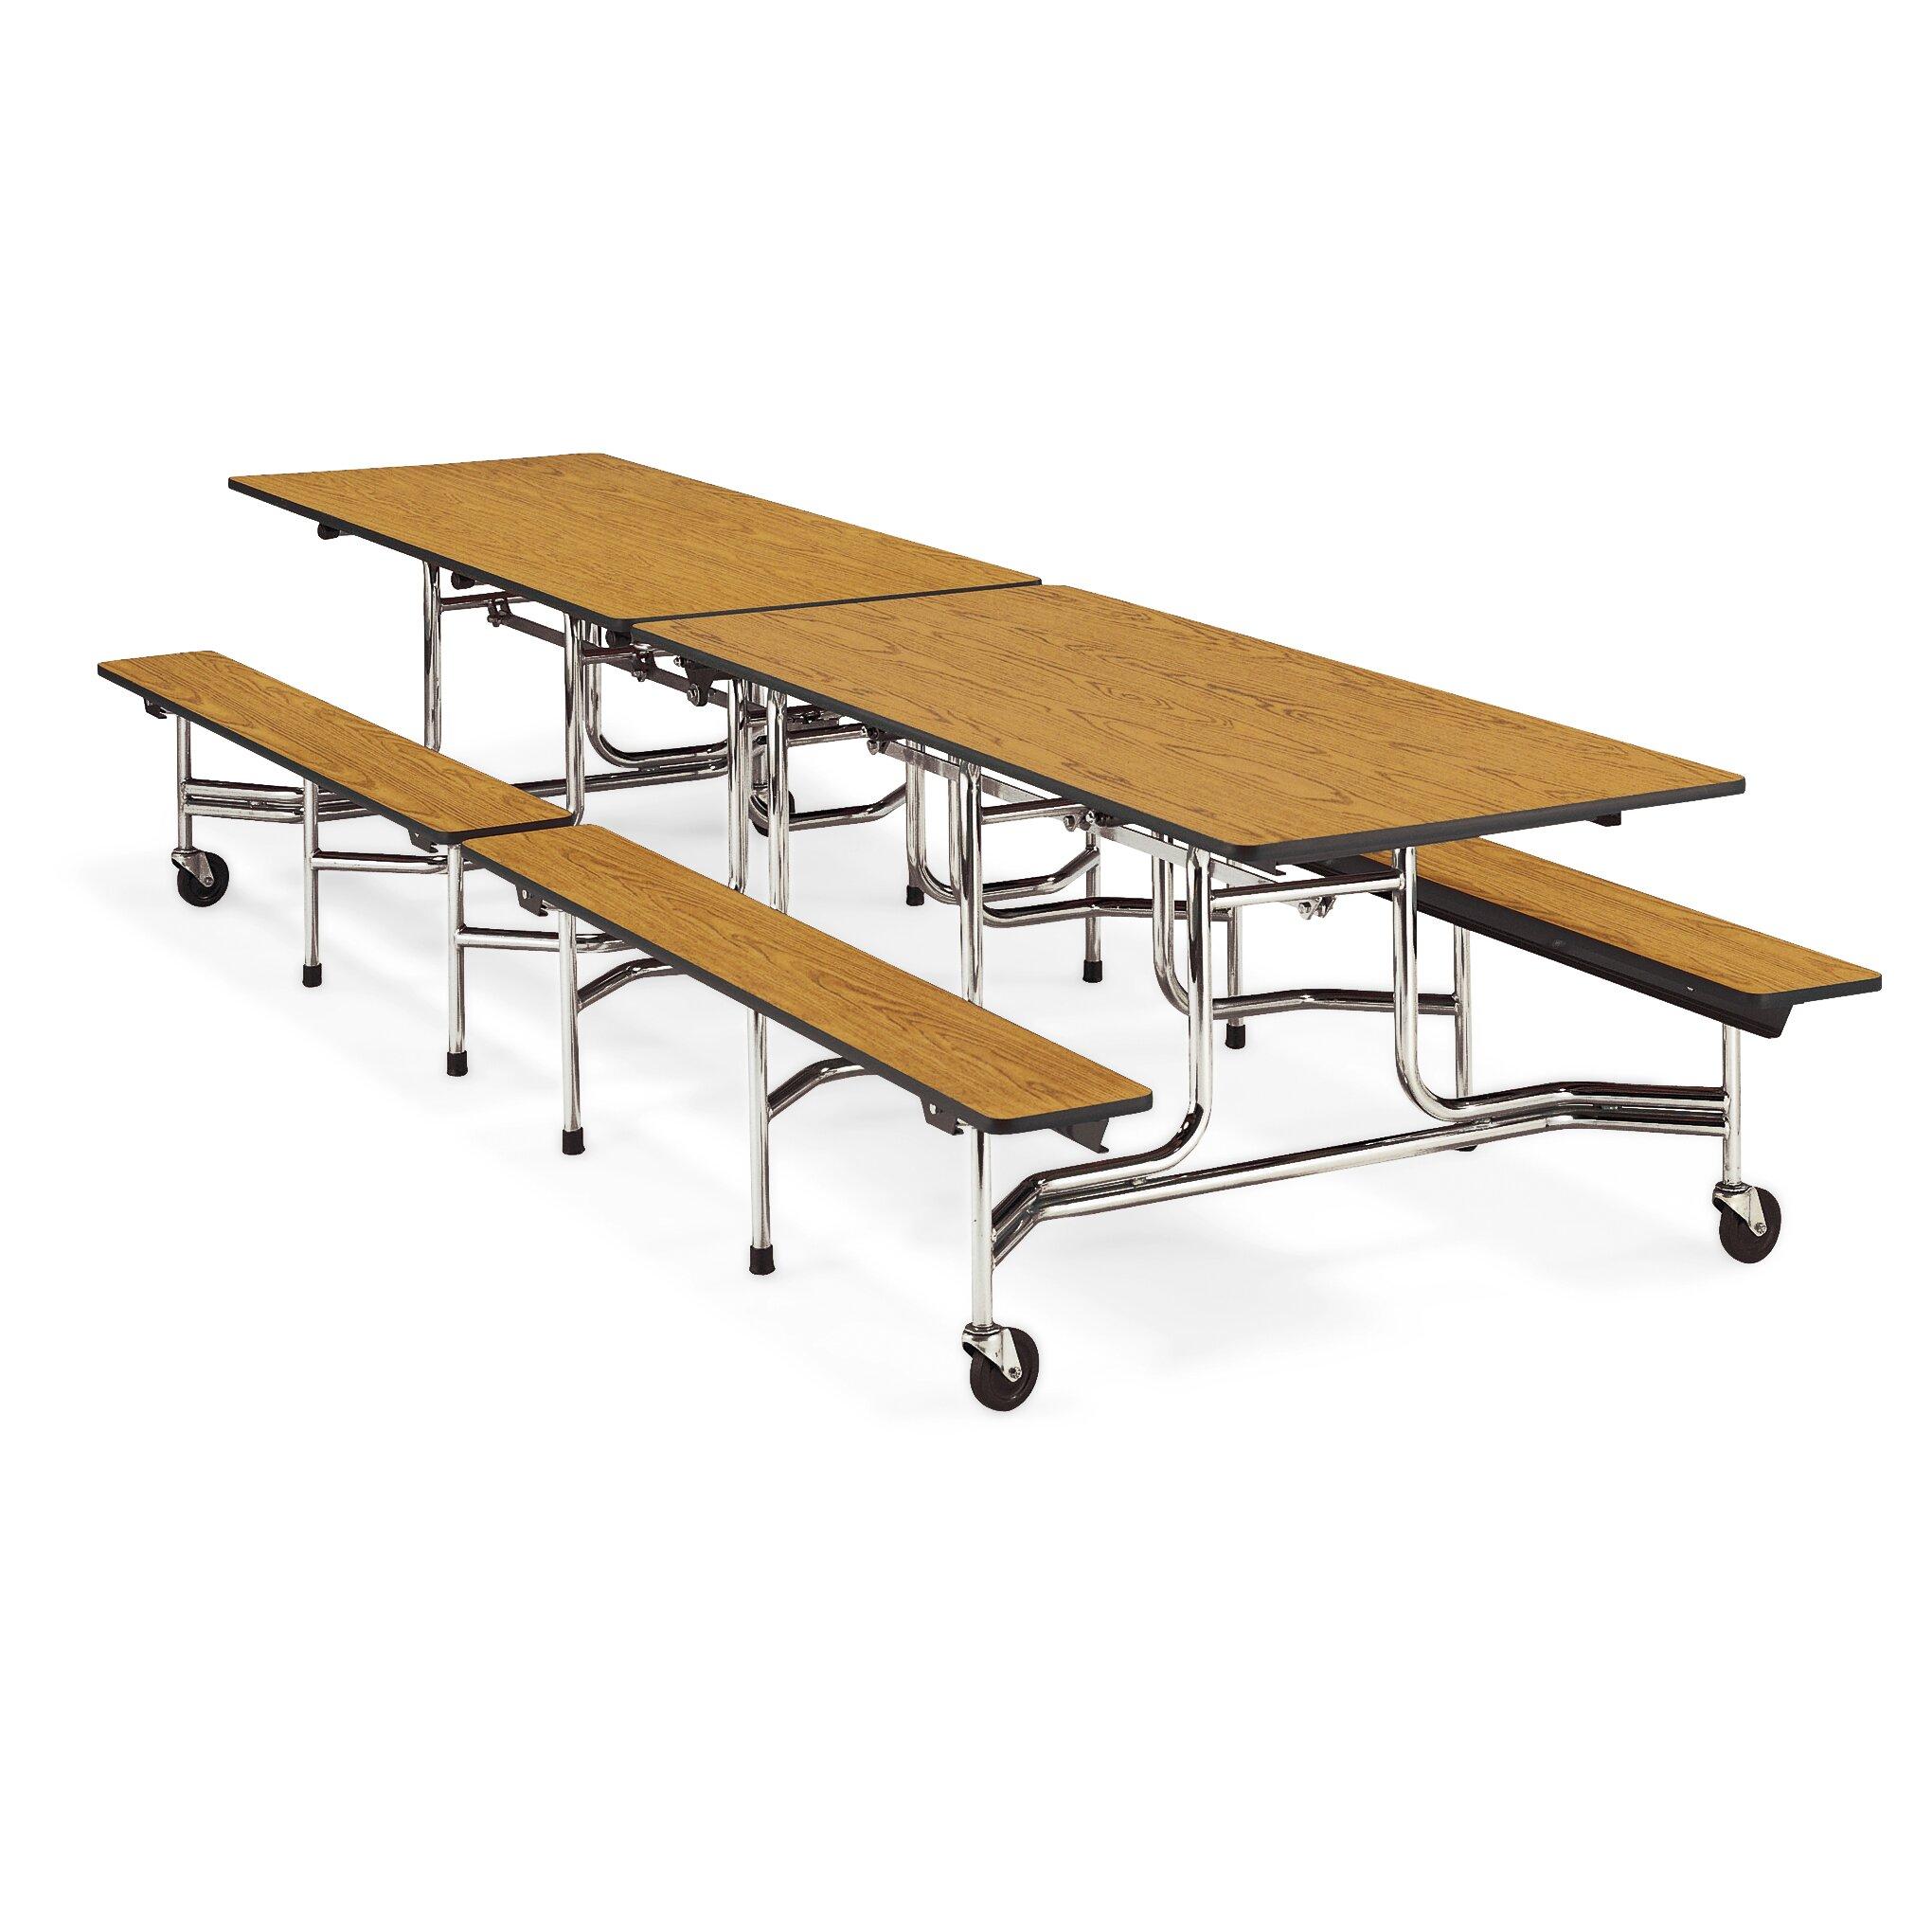 12 x 30 rectangular cafeteria table wayfair supply for 12 x 30 table